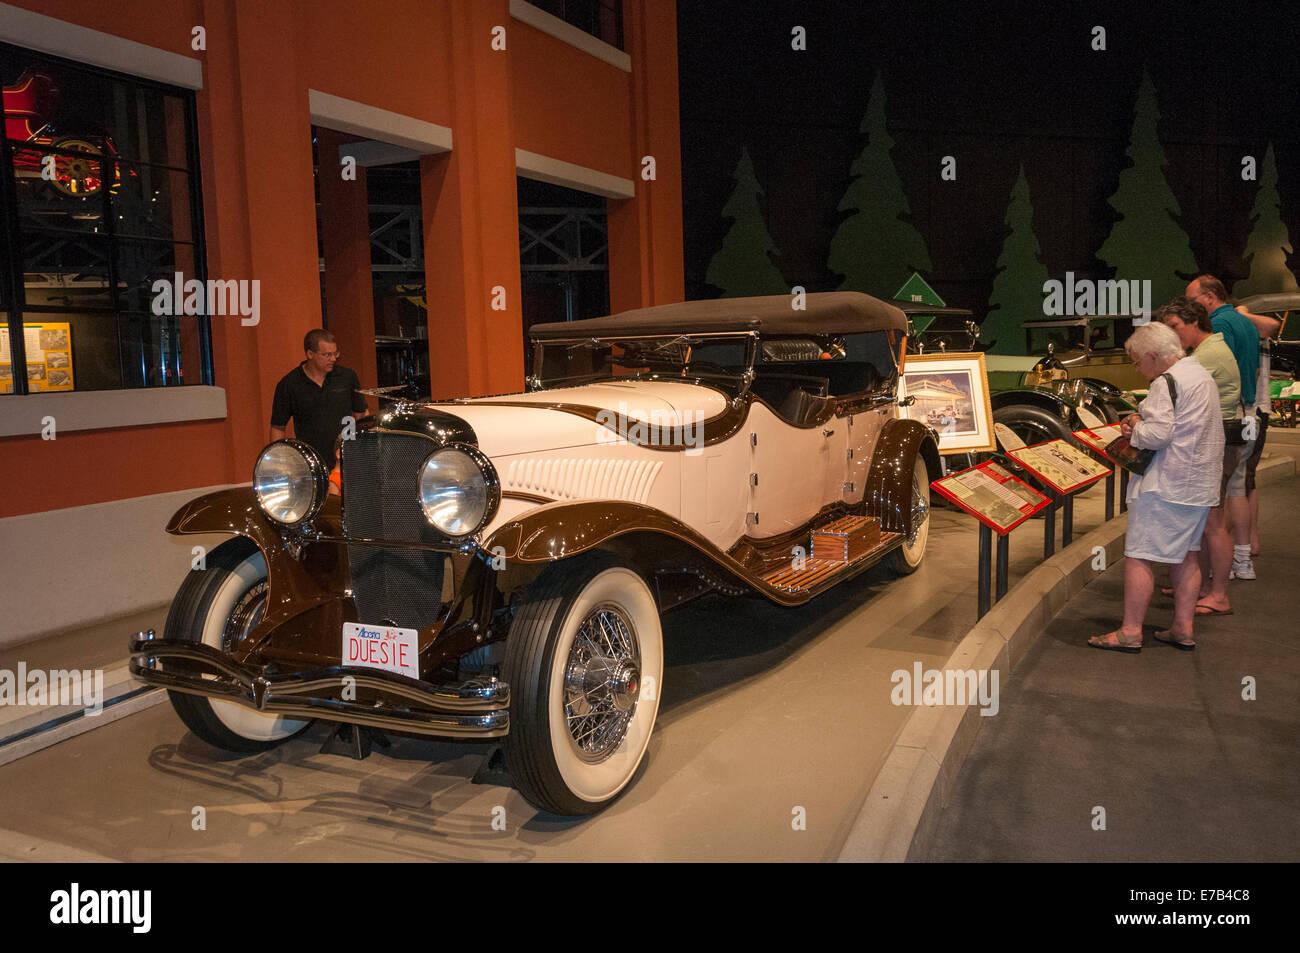 Elk203-5681 Wetaskiwin, Alberta, Canadá, museo Reynolds-Alberta, automóviles antiguos Imagen De Stock